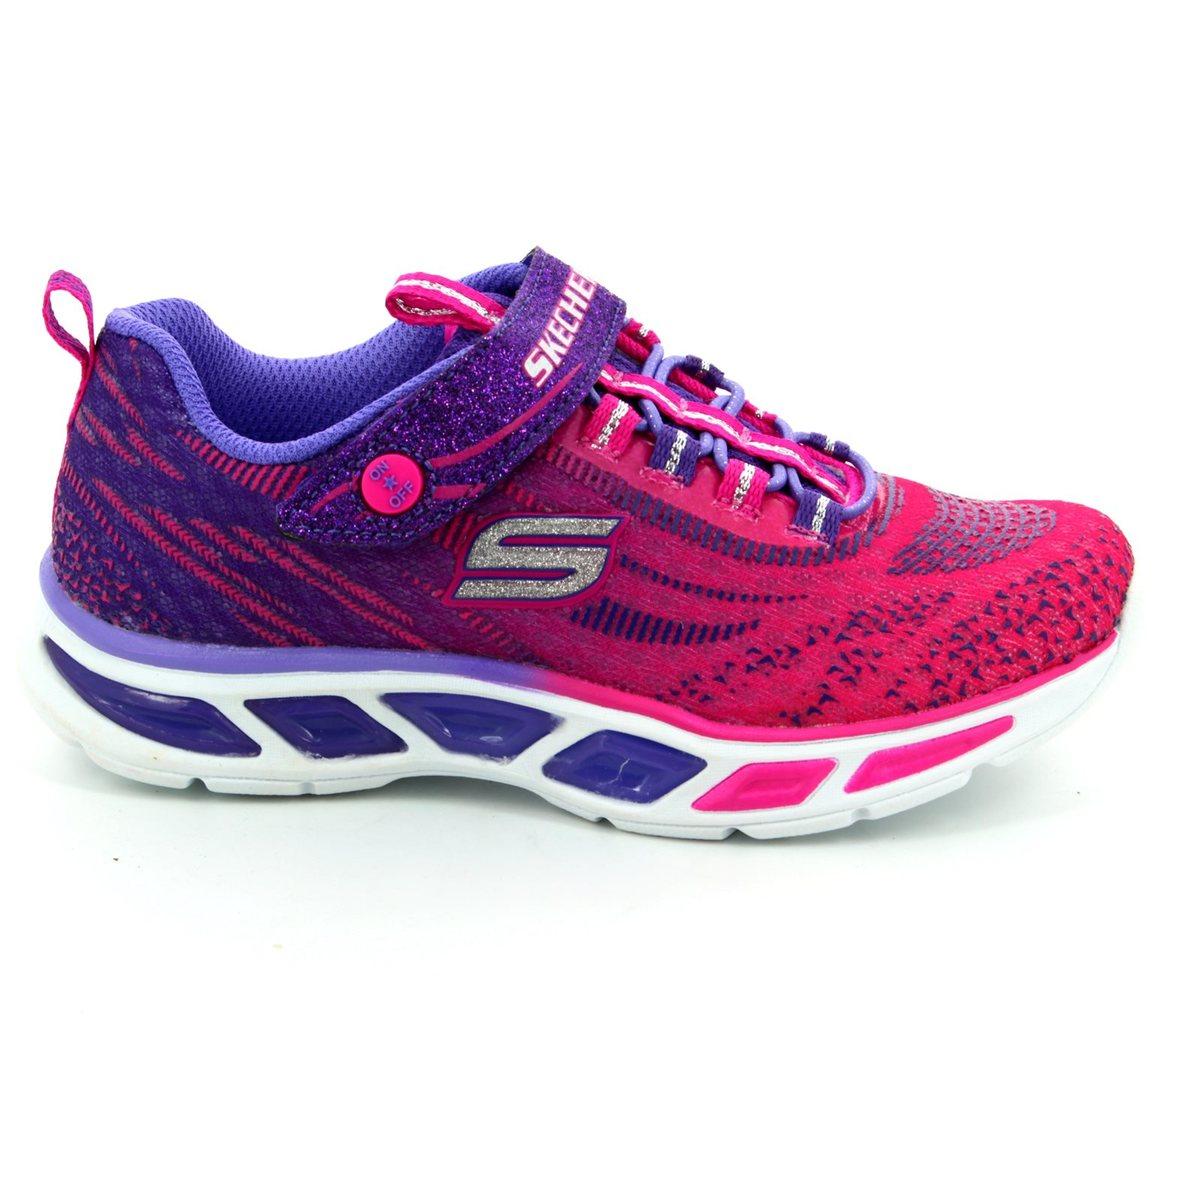 Skechers - Litebeams - pink Mesh - 10667L-HPPR - EU=30 cmNn4wKA